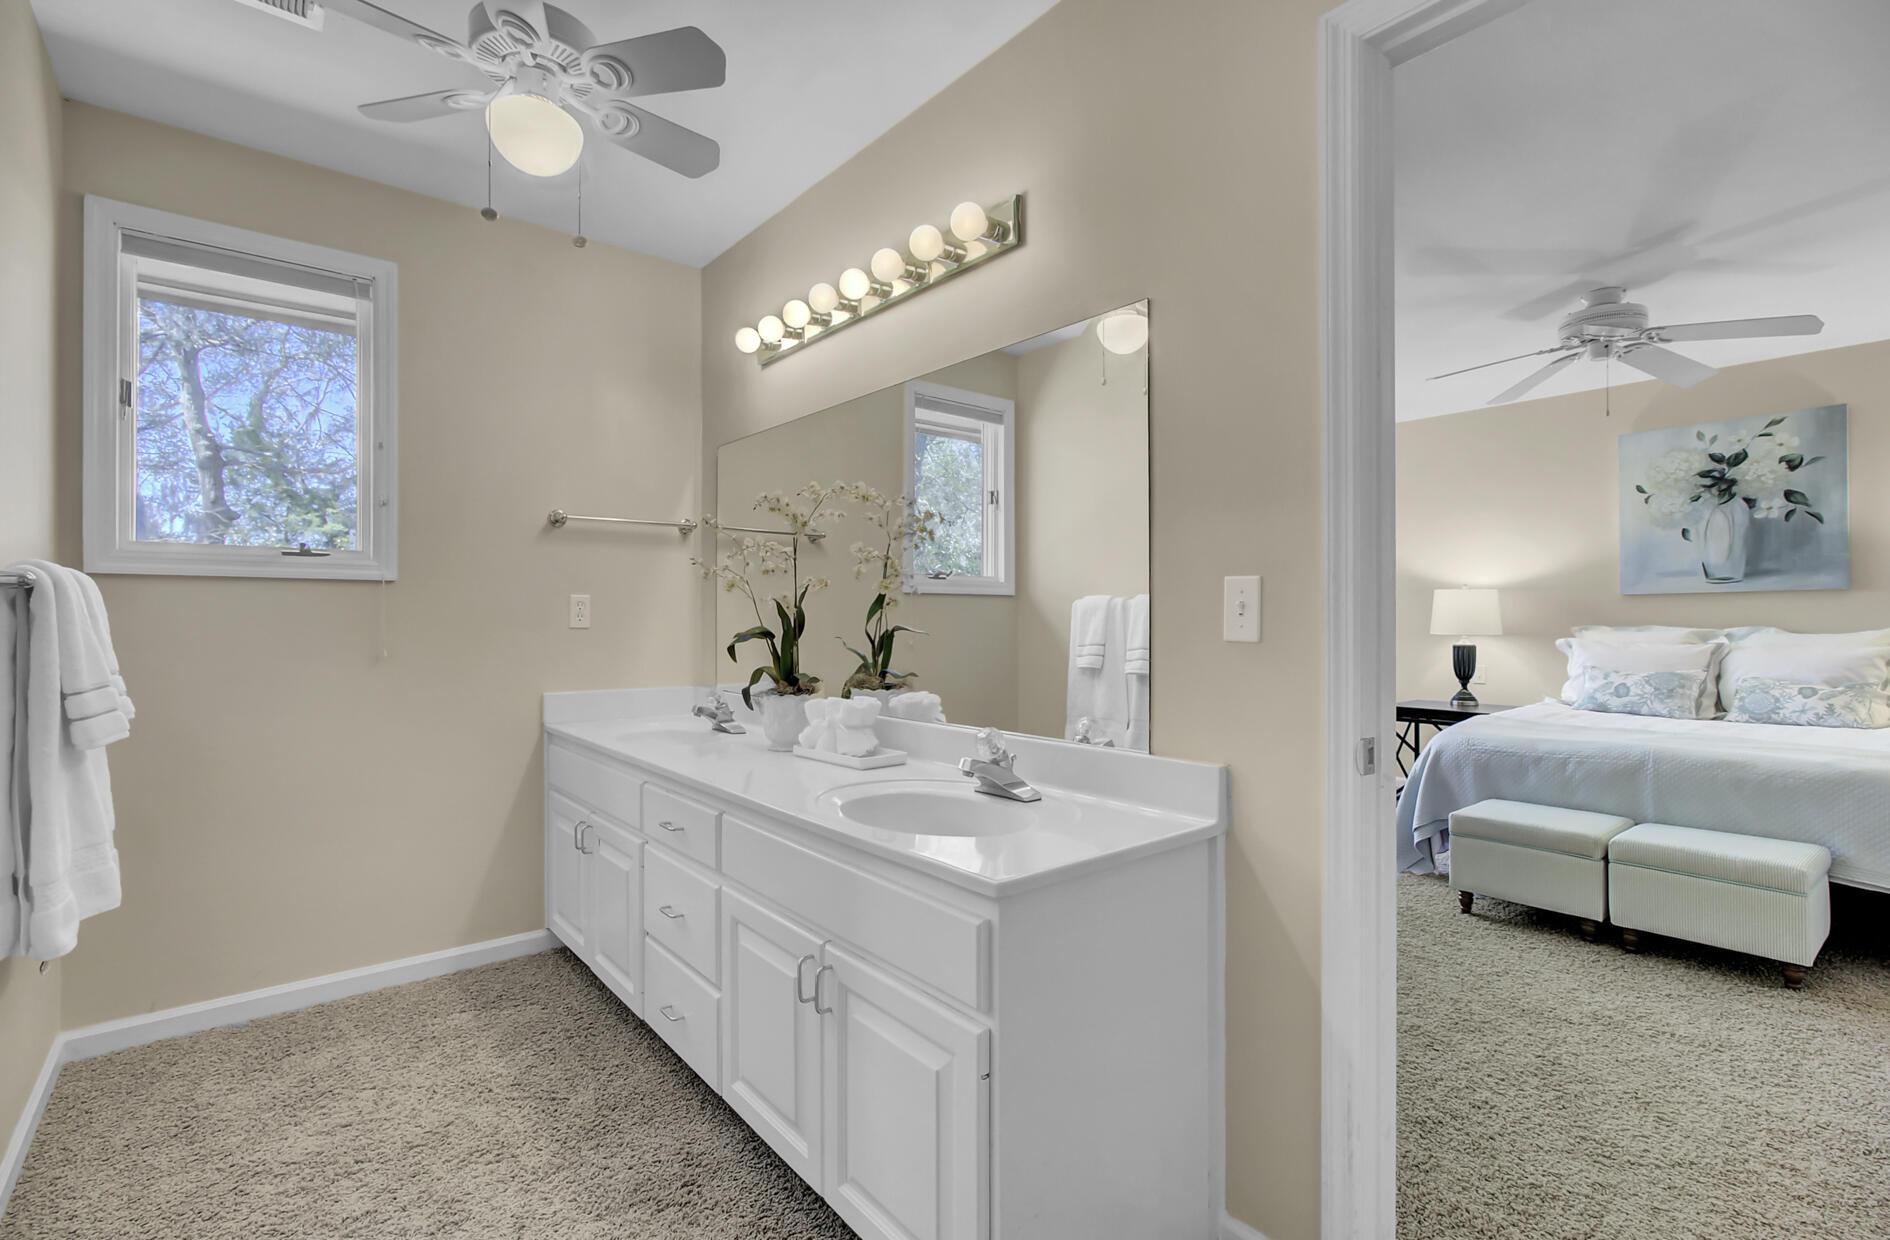 Wappoo Creek Place Homes For Sale - 29 Wappoo Creek, Charleston, SC - 12